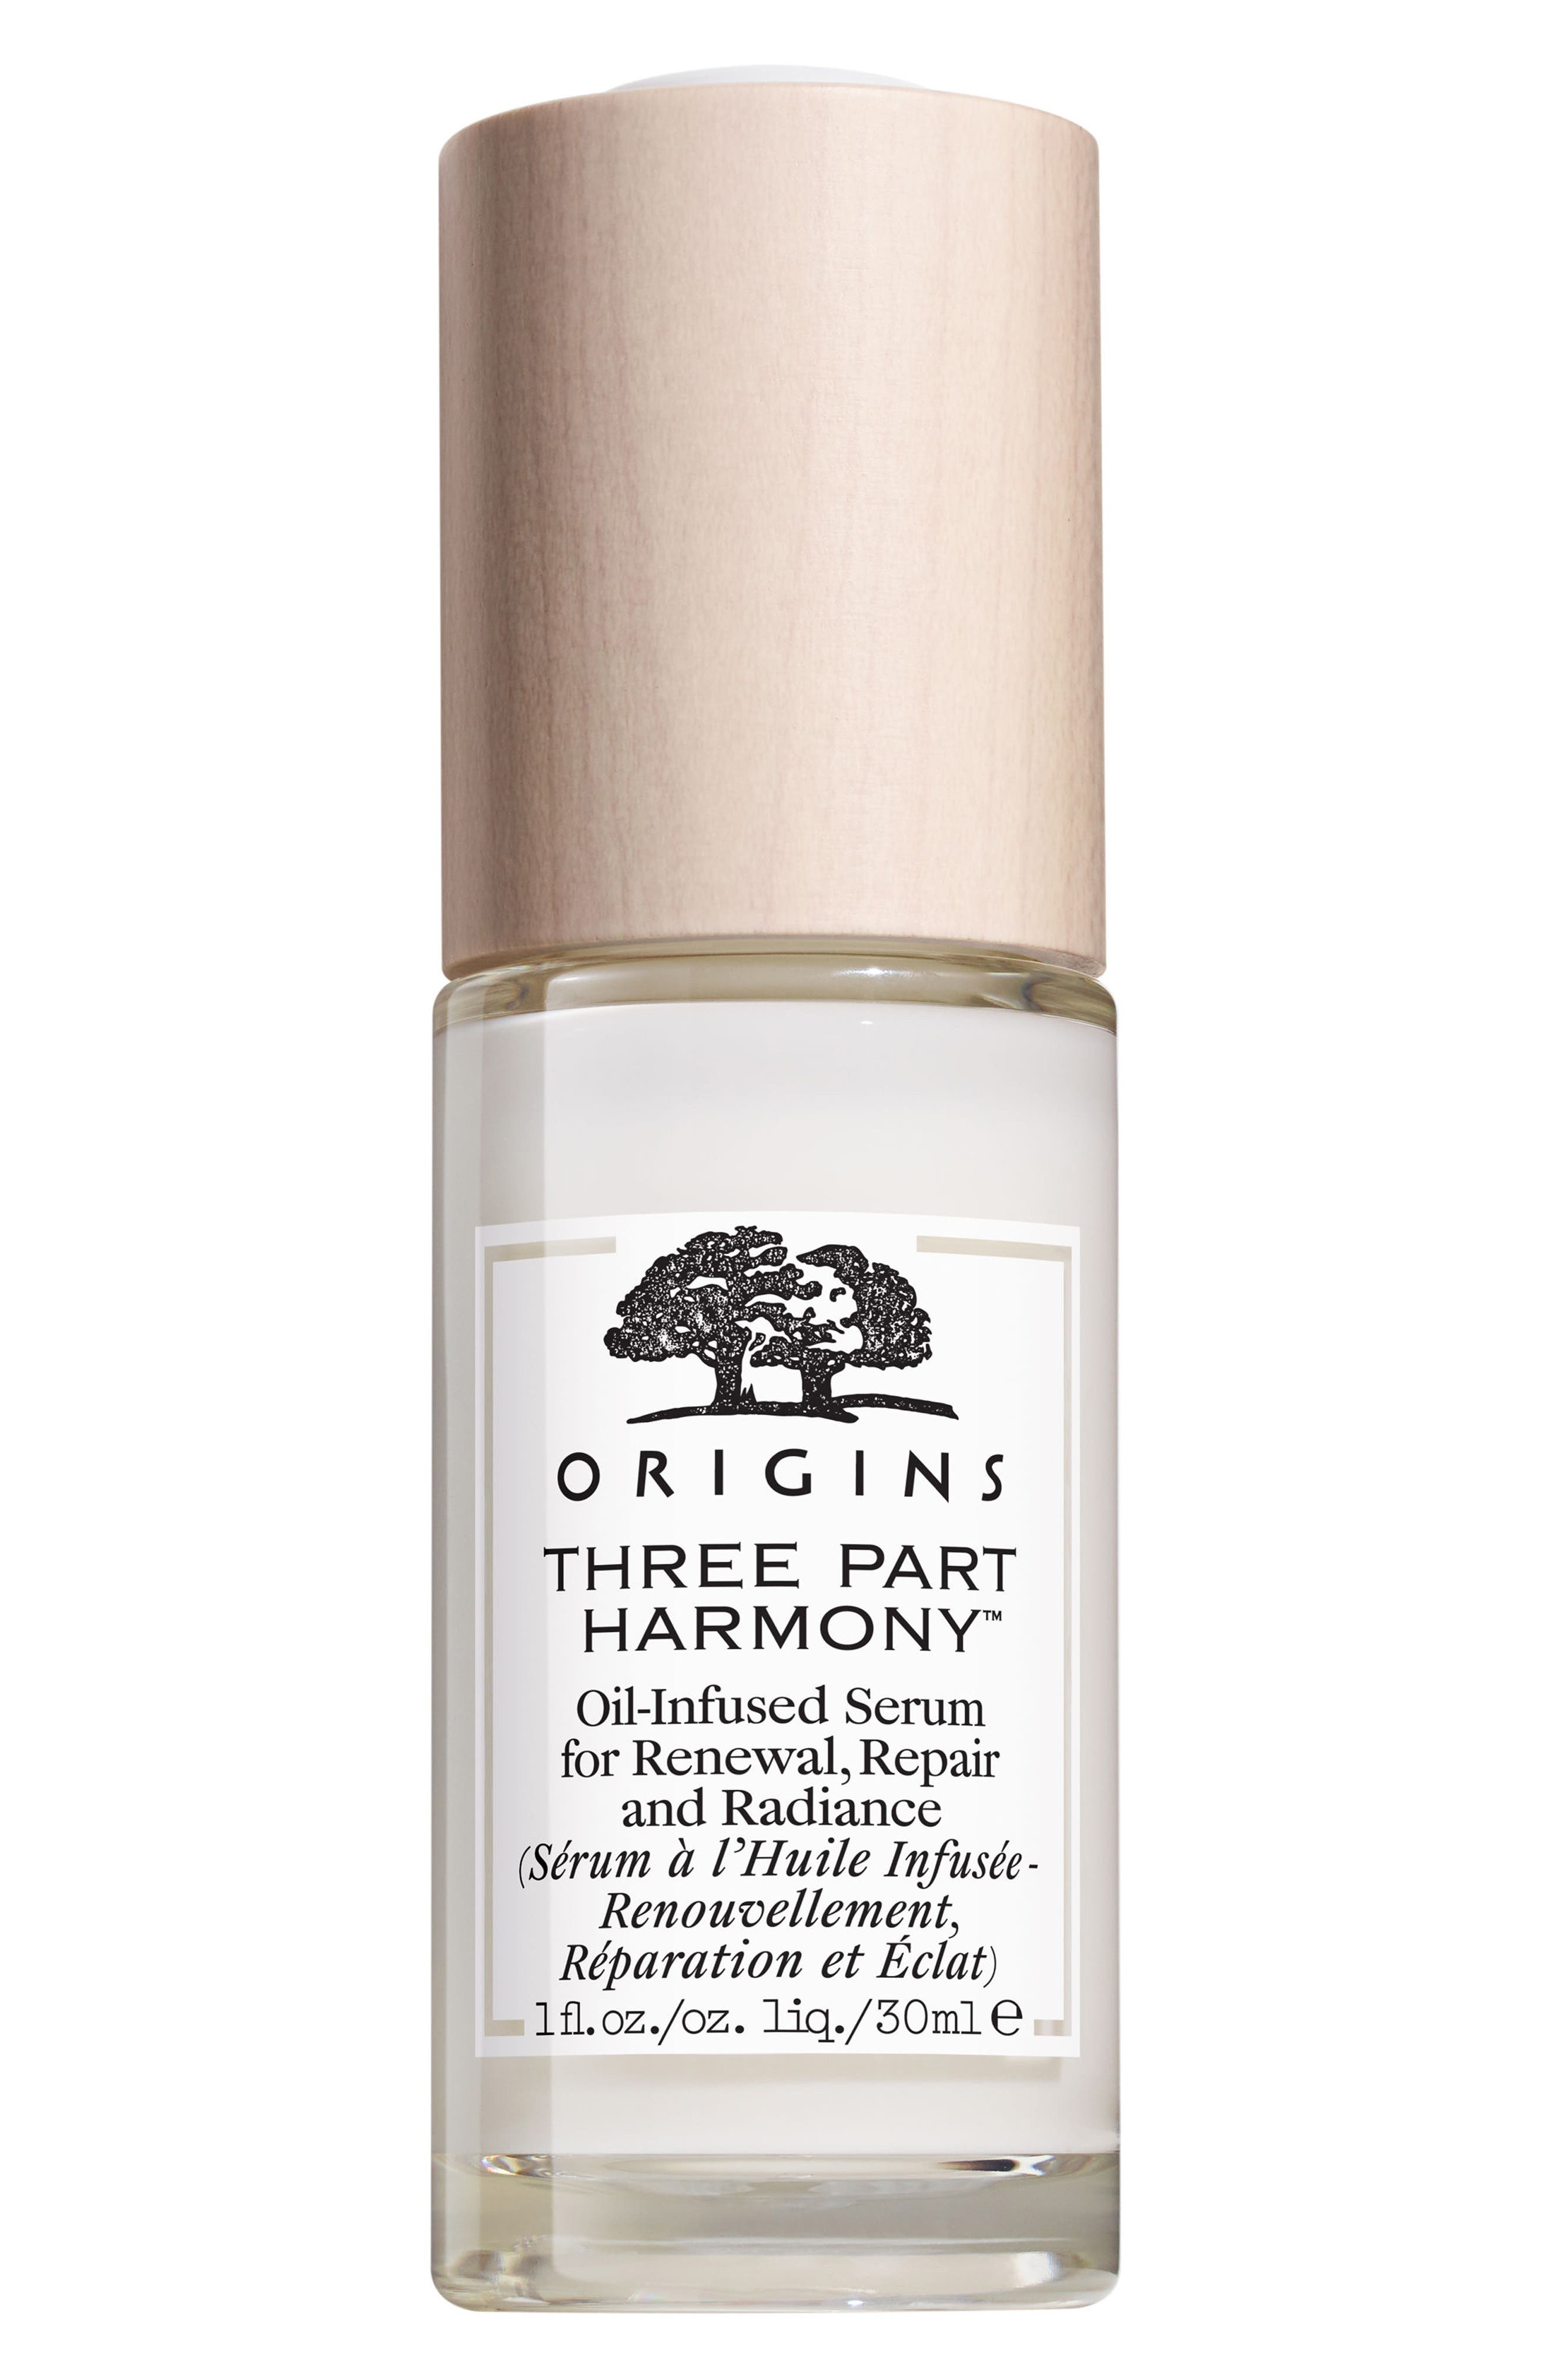 Origins Three Part Harmony™ Oil-Infused Serum for Renewal, Repair & Radiance